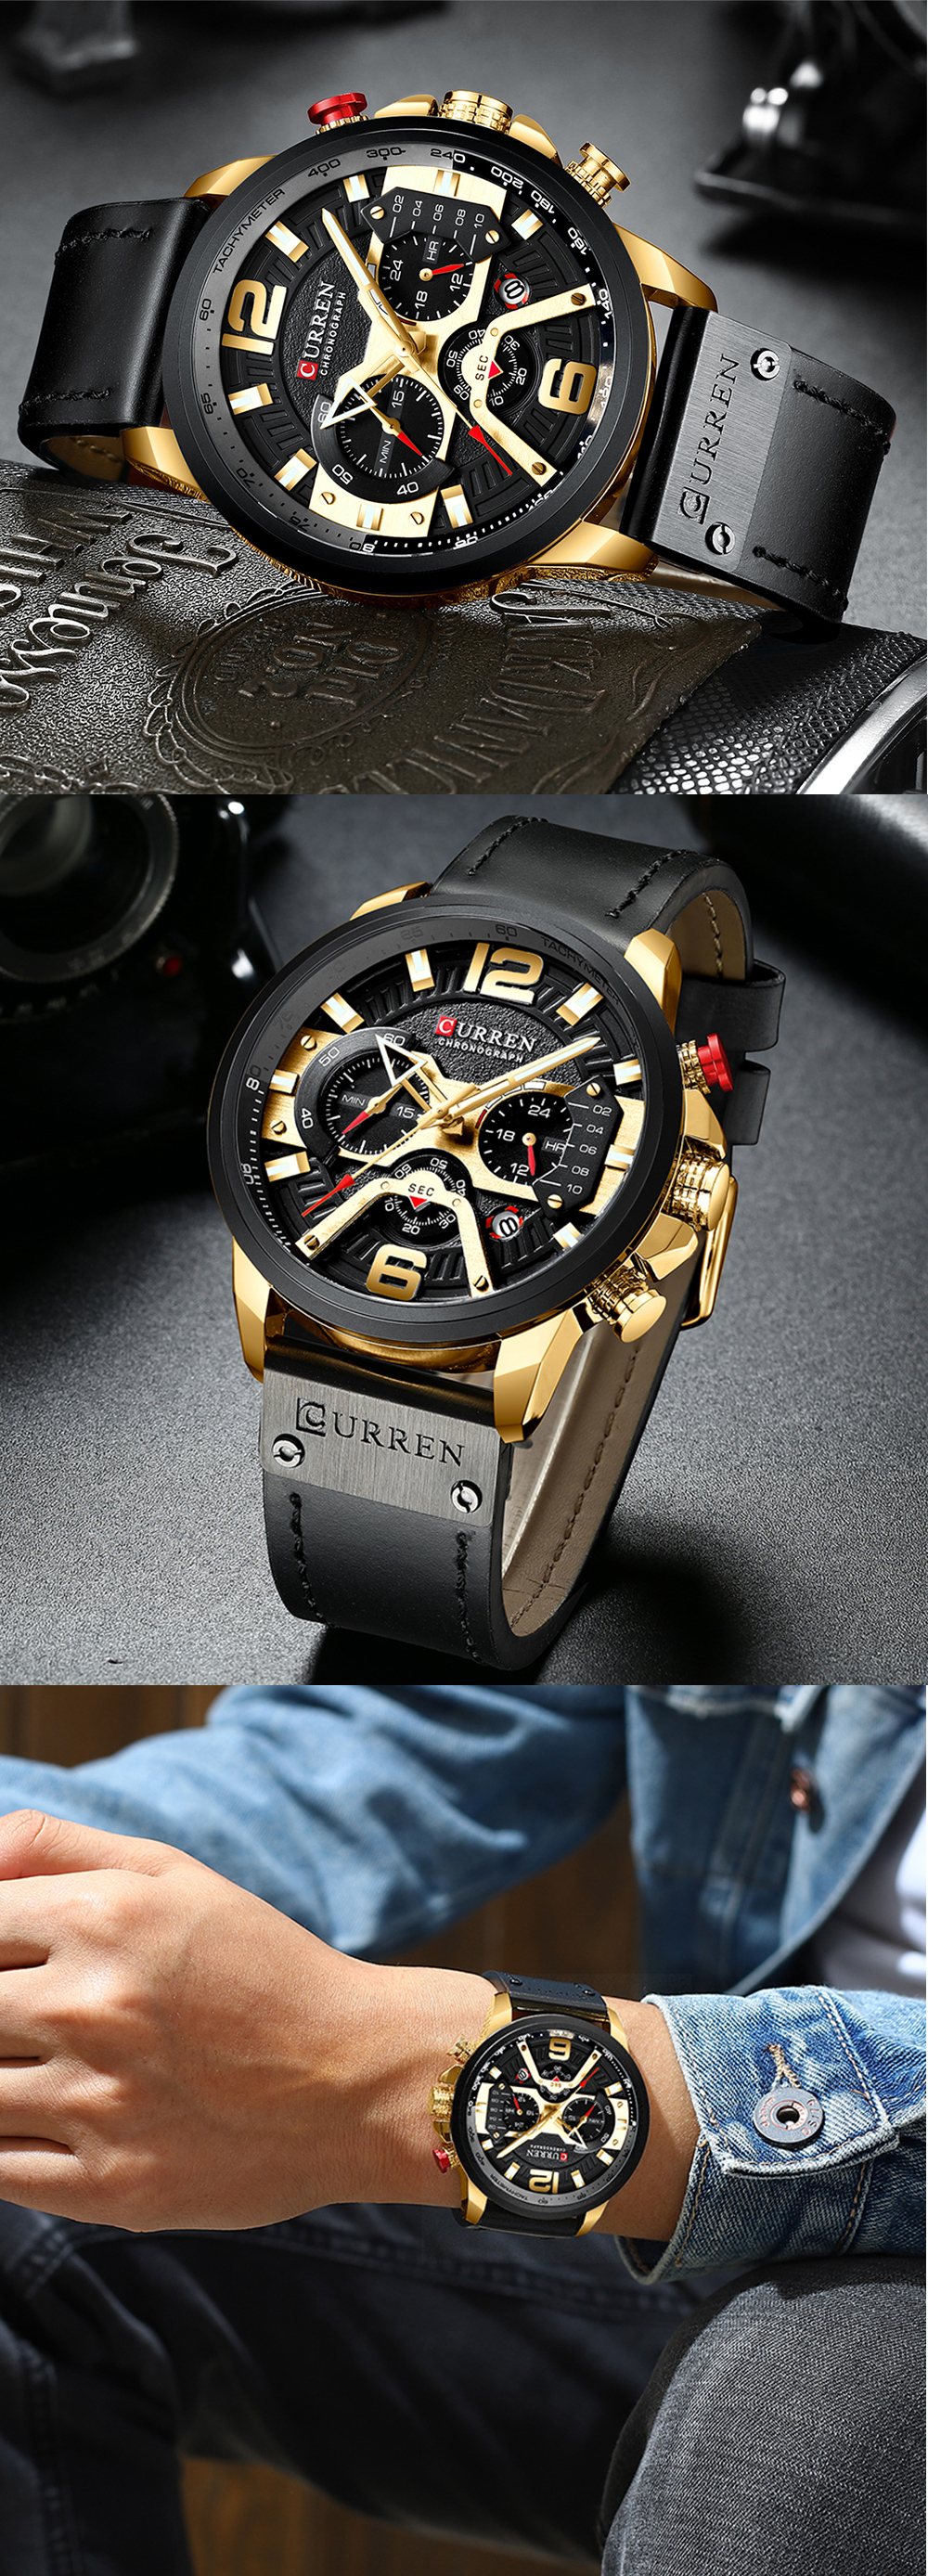 Watches Men CURREN Brand Men Sport Watches Men's Quartz Clock Man Casual Military Waterproof Wrist Watch relogio masculino